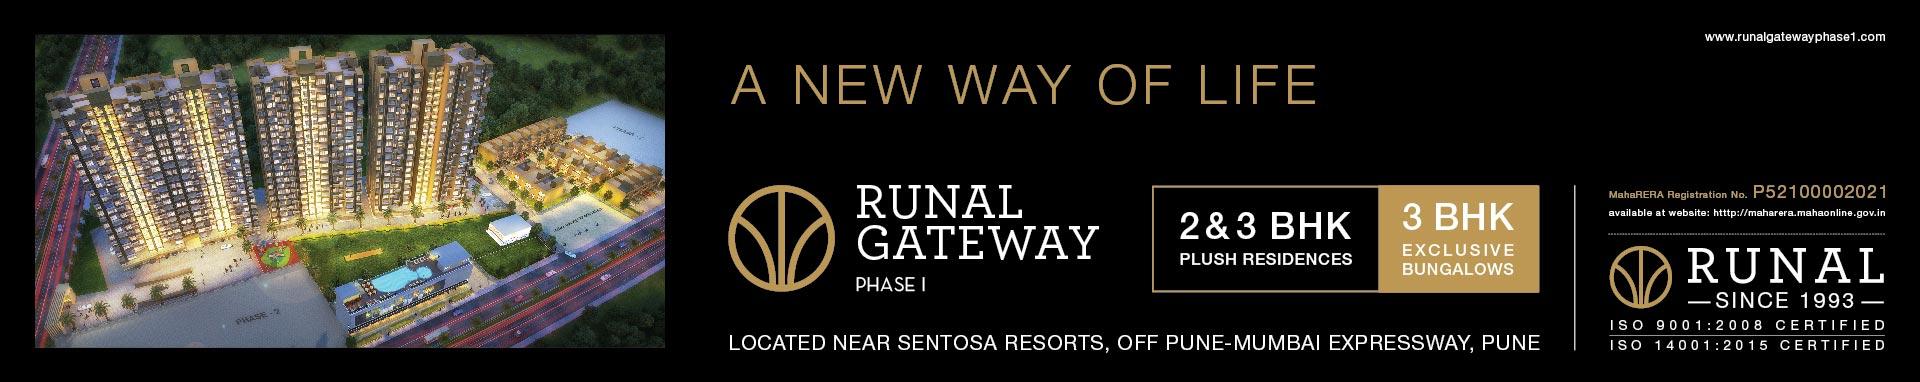 Runal Gateway by Runal developers